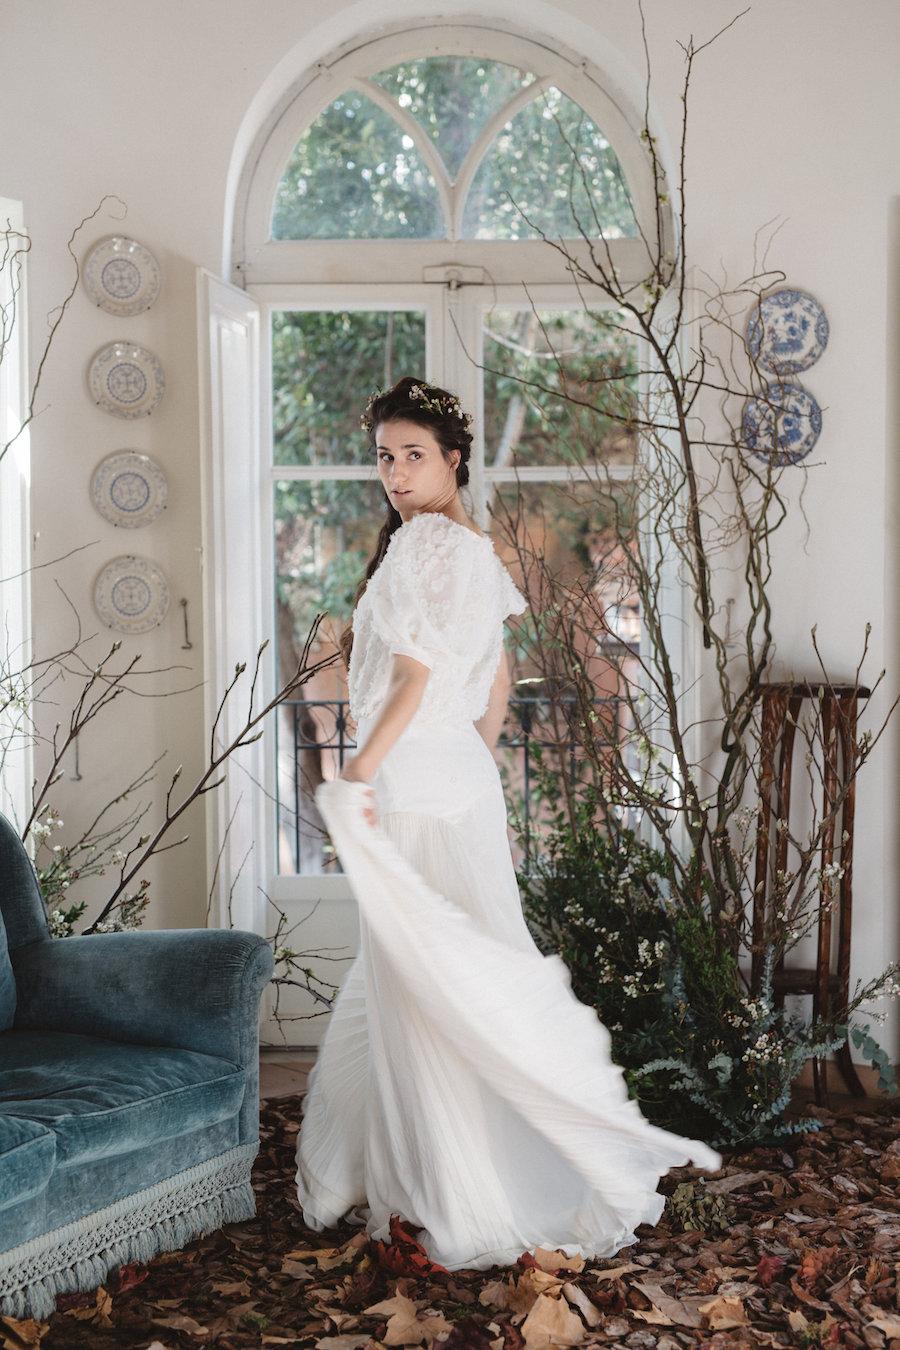 silvia moretta wed lab 2018